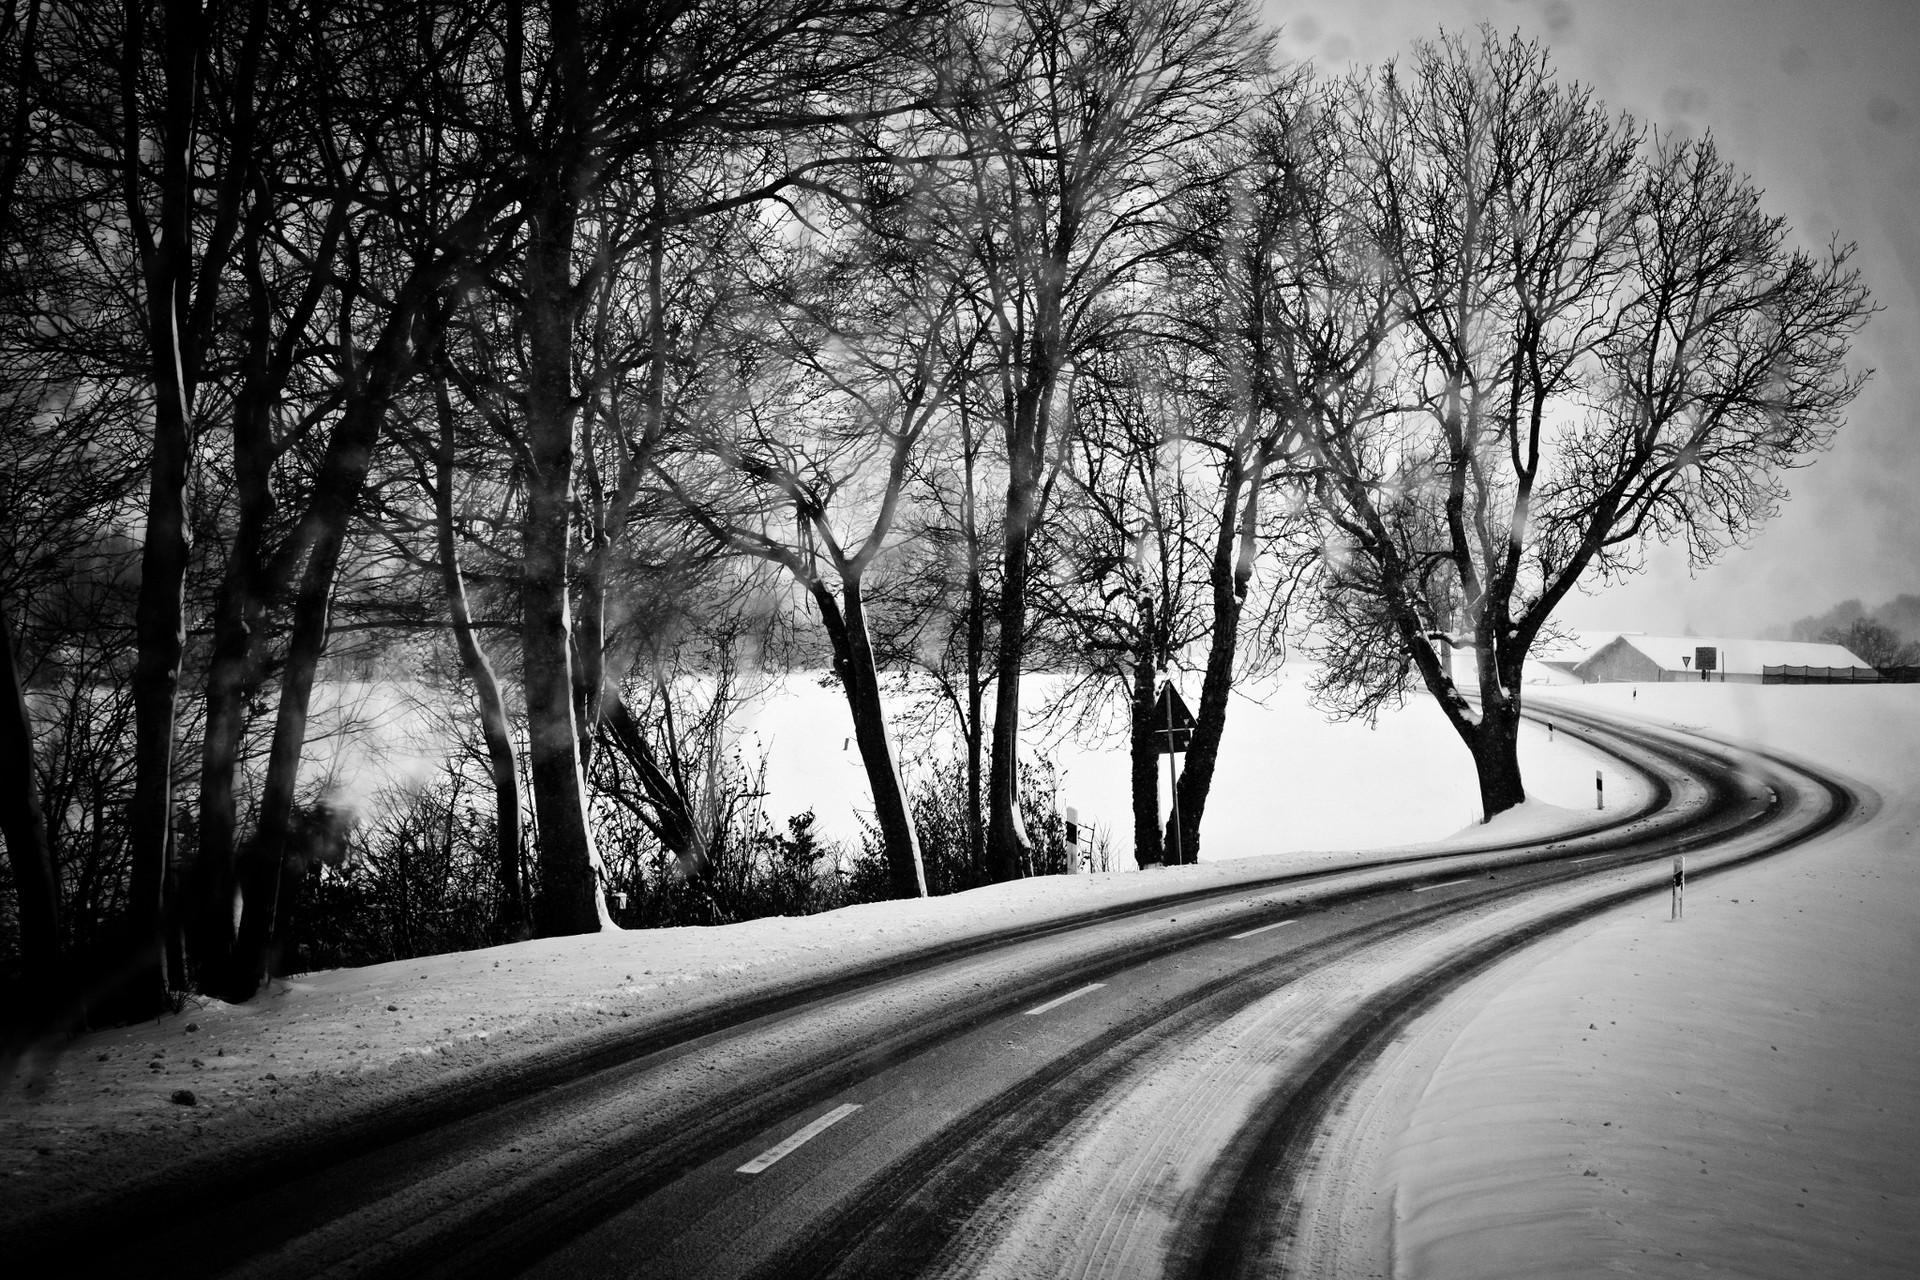 General 1920x1280 monochrome winter road snow trees overcast snowing